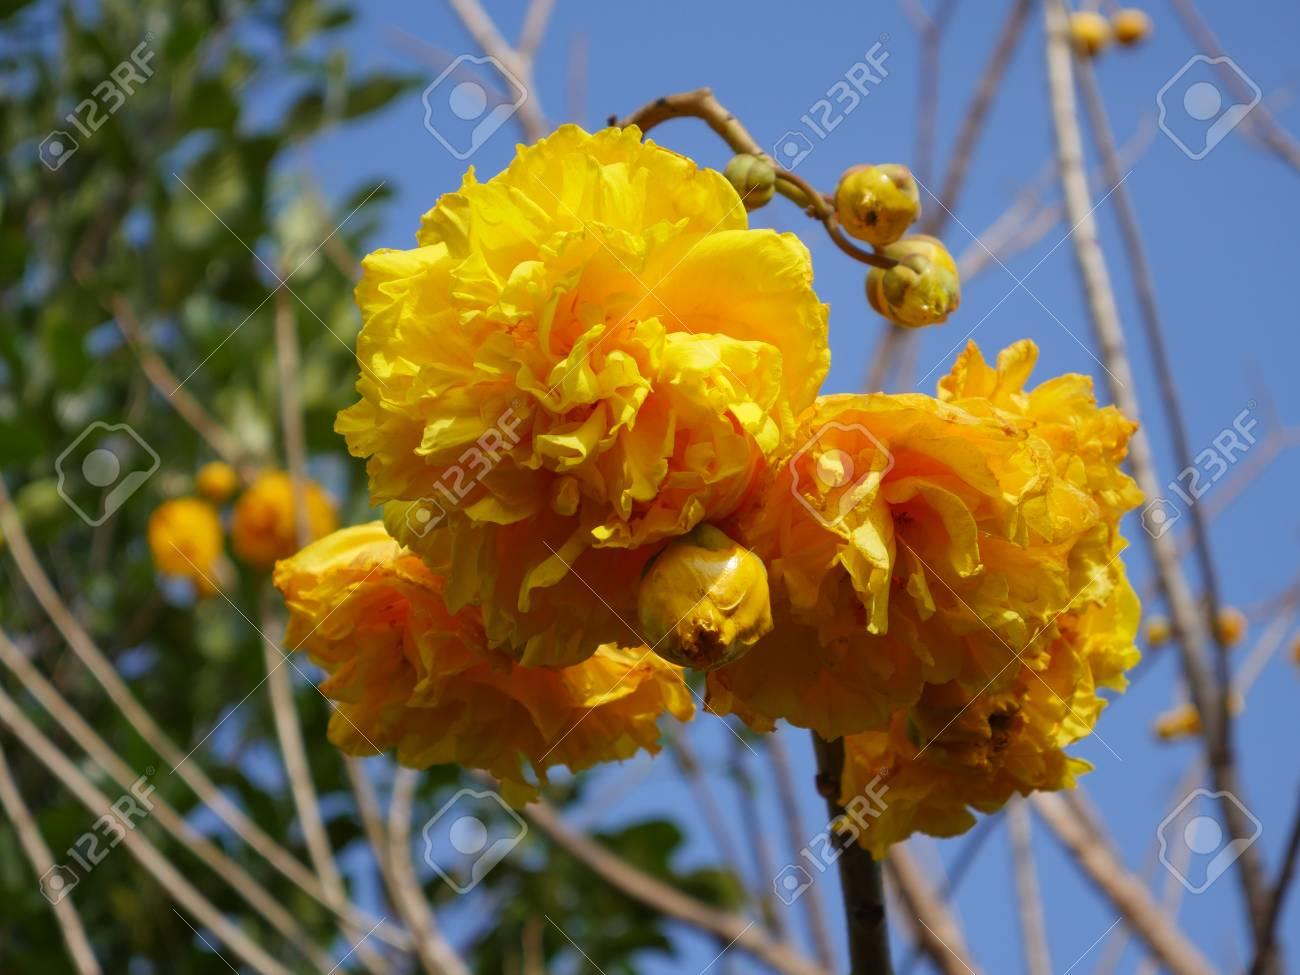 Cochlospermum regium golden yellow flowers beautiful in a clear cochlospermum regium golden yellow flowers beautiful in a clear day stock photo 58147244 mightylinksfo